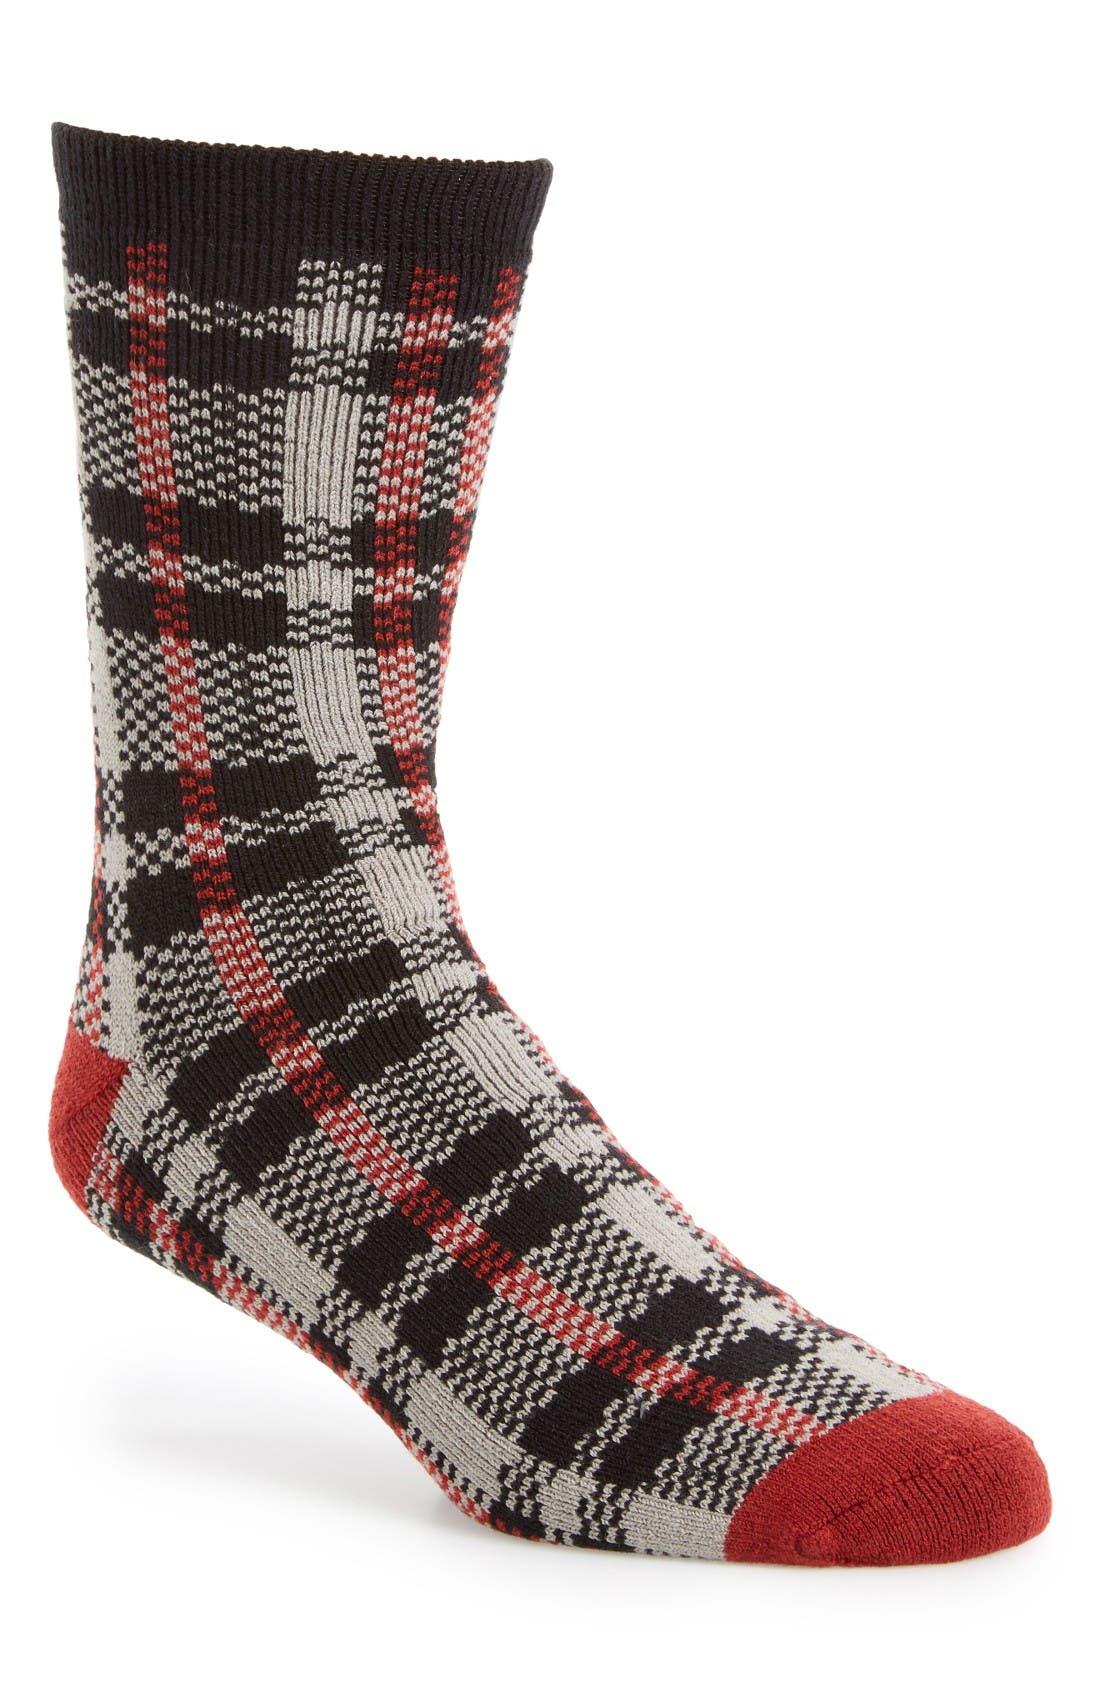 Plaid Socks,                             Main thumbnail 1, color,                             Seal Plaid